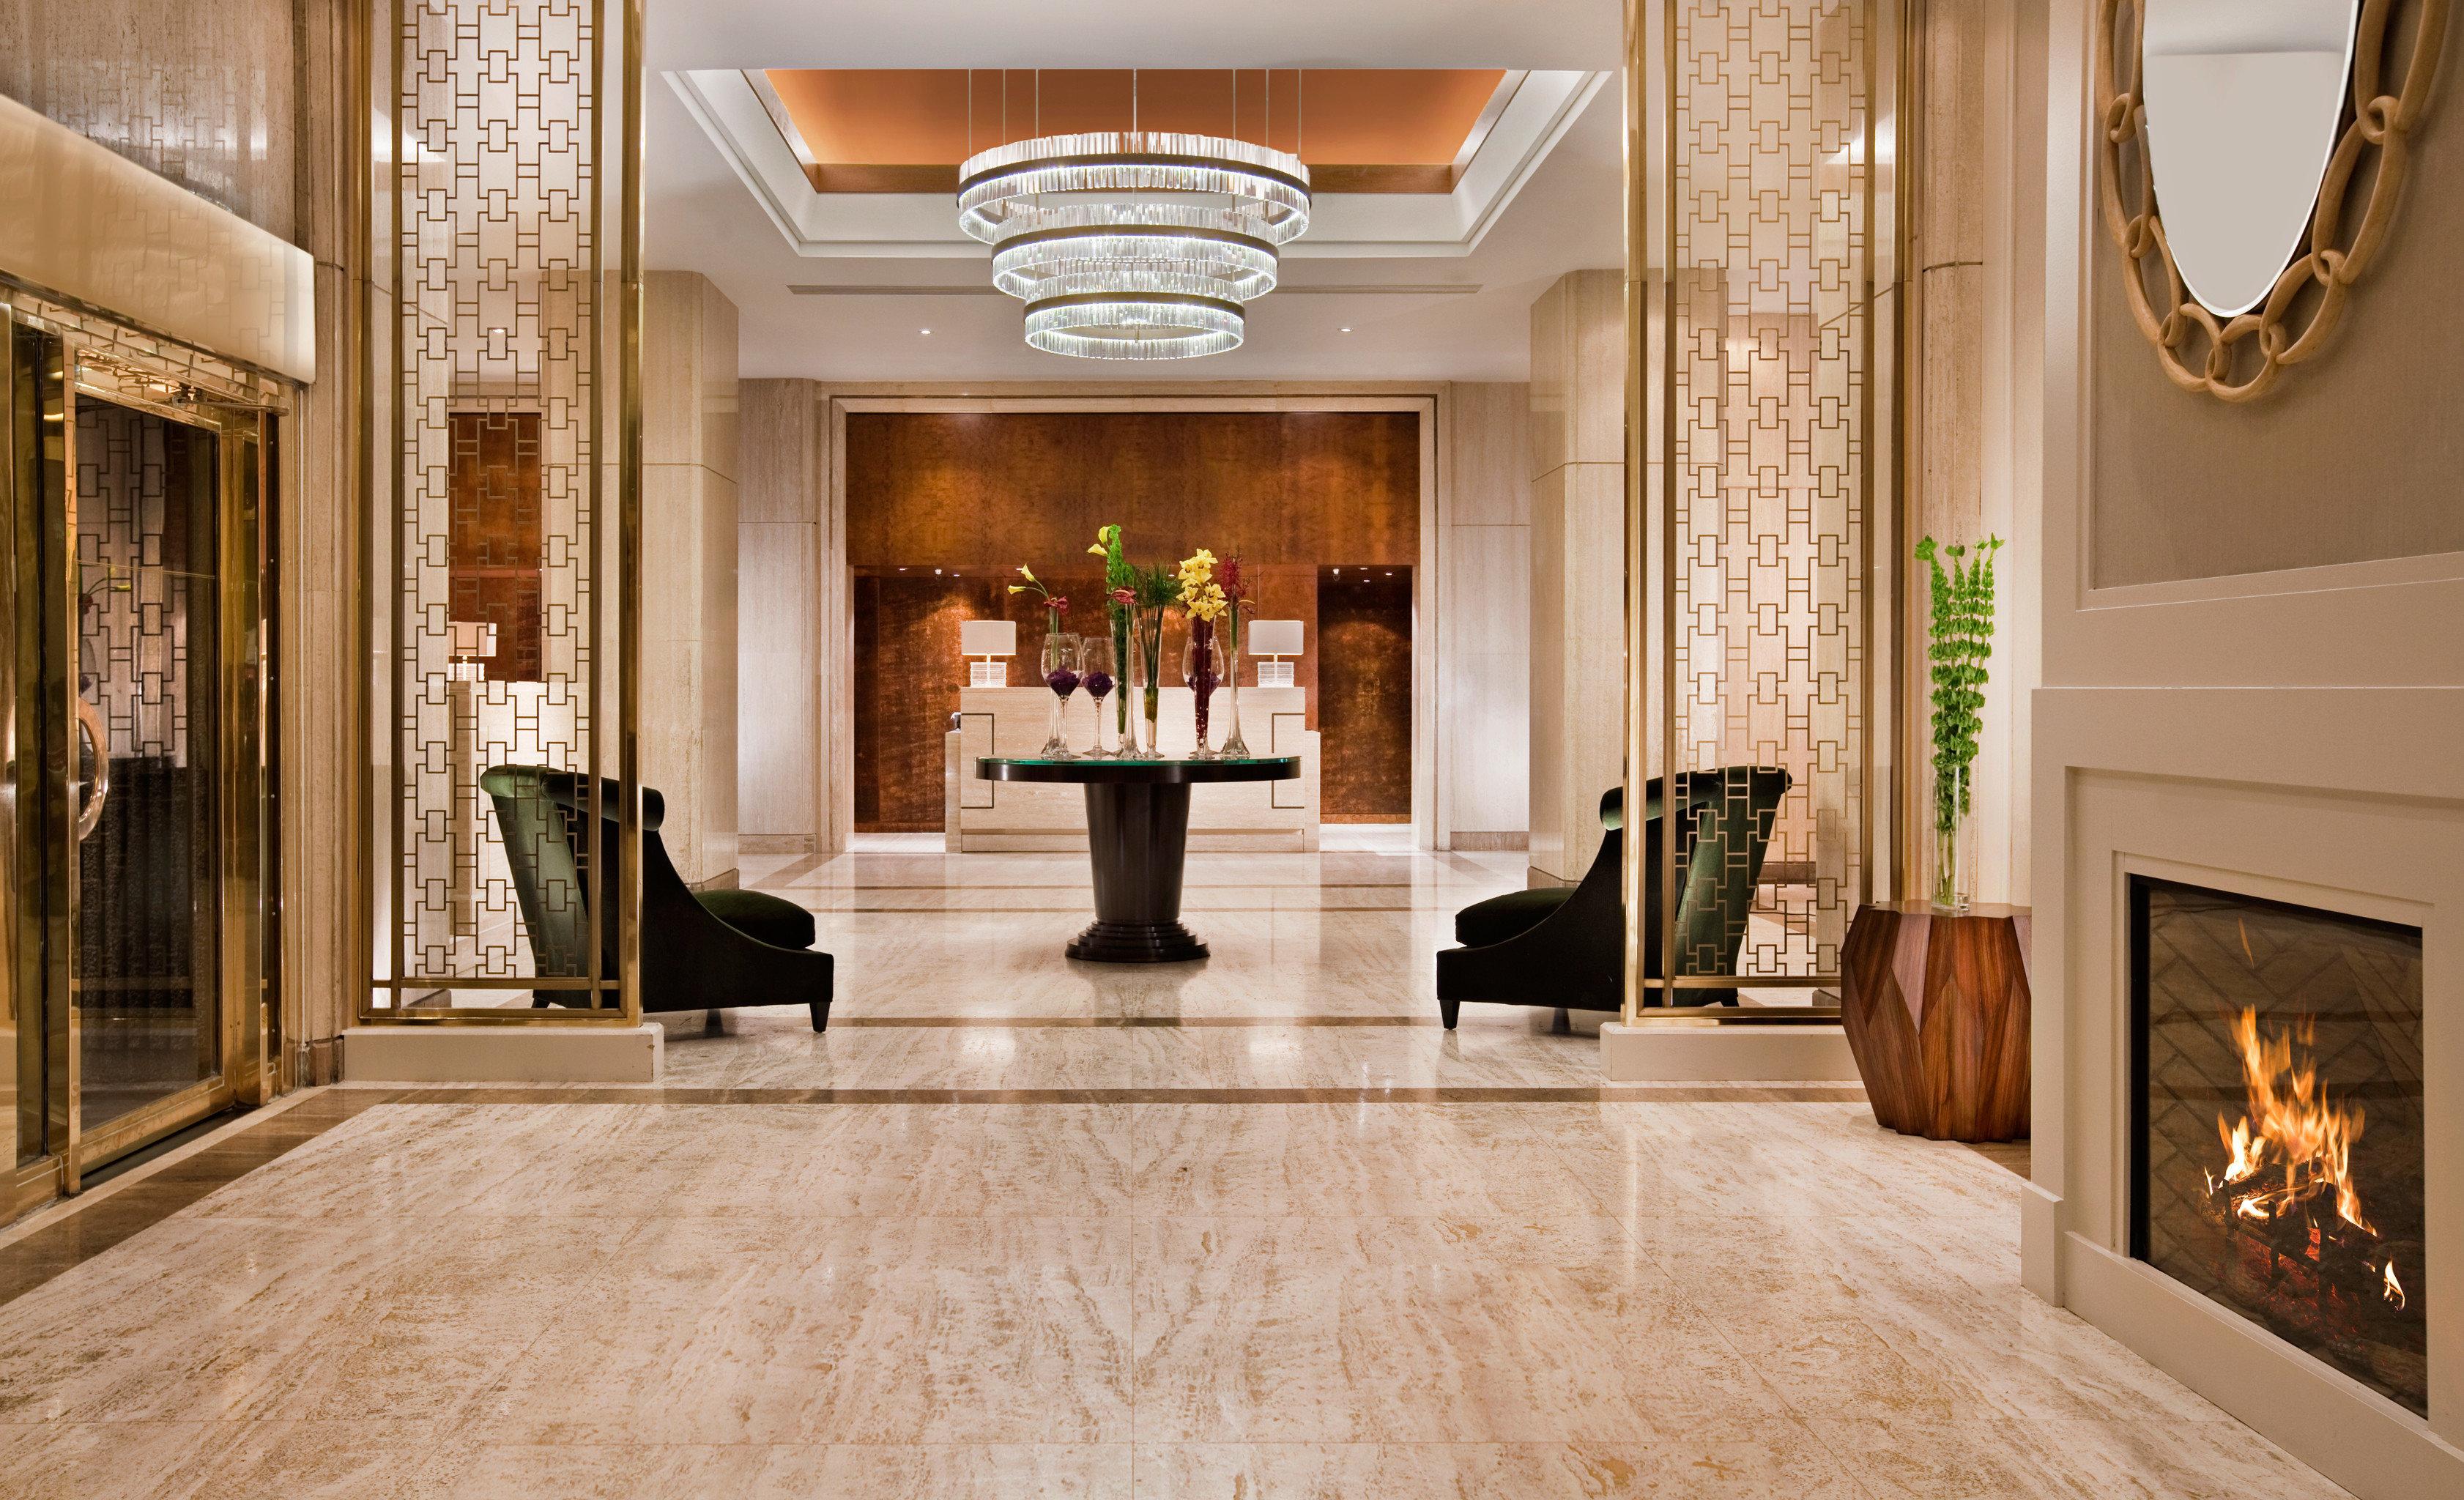 City Lobby Modern building property Fireplace home mansion hardwood living room flooring wood flooring hall stone